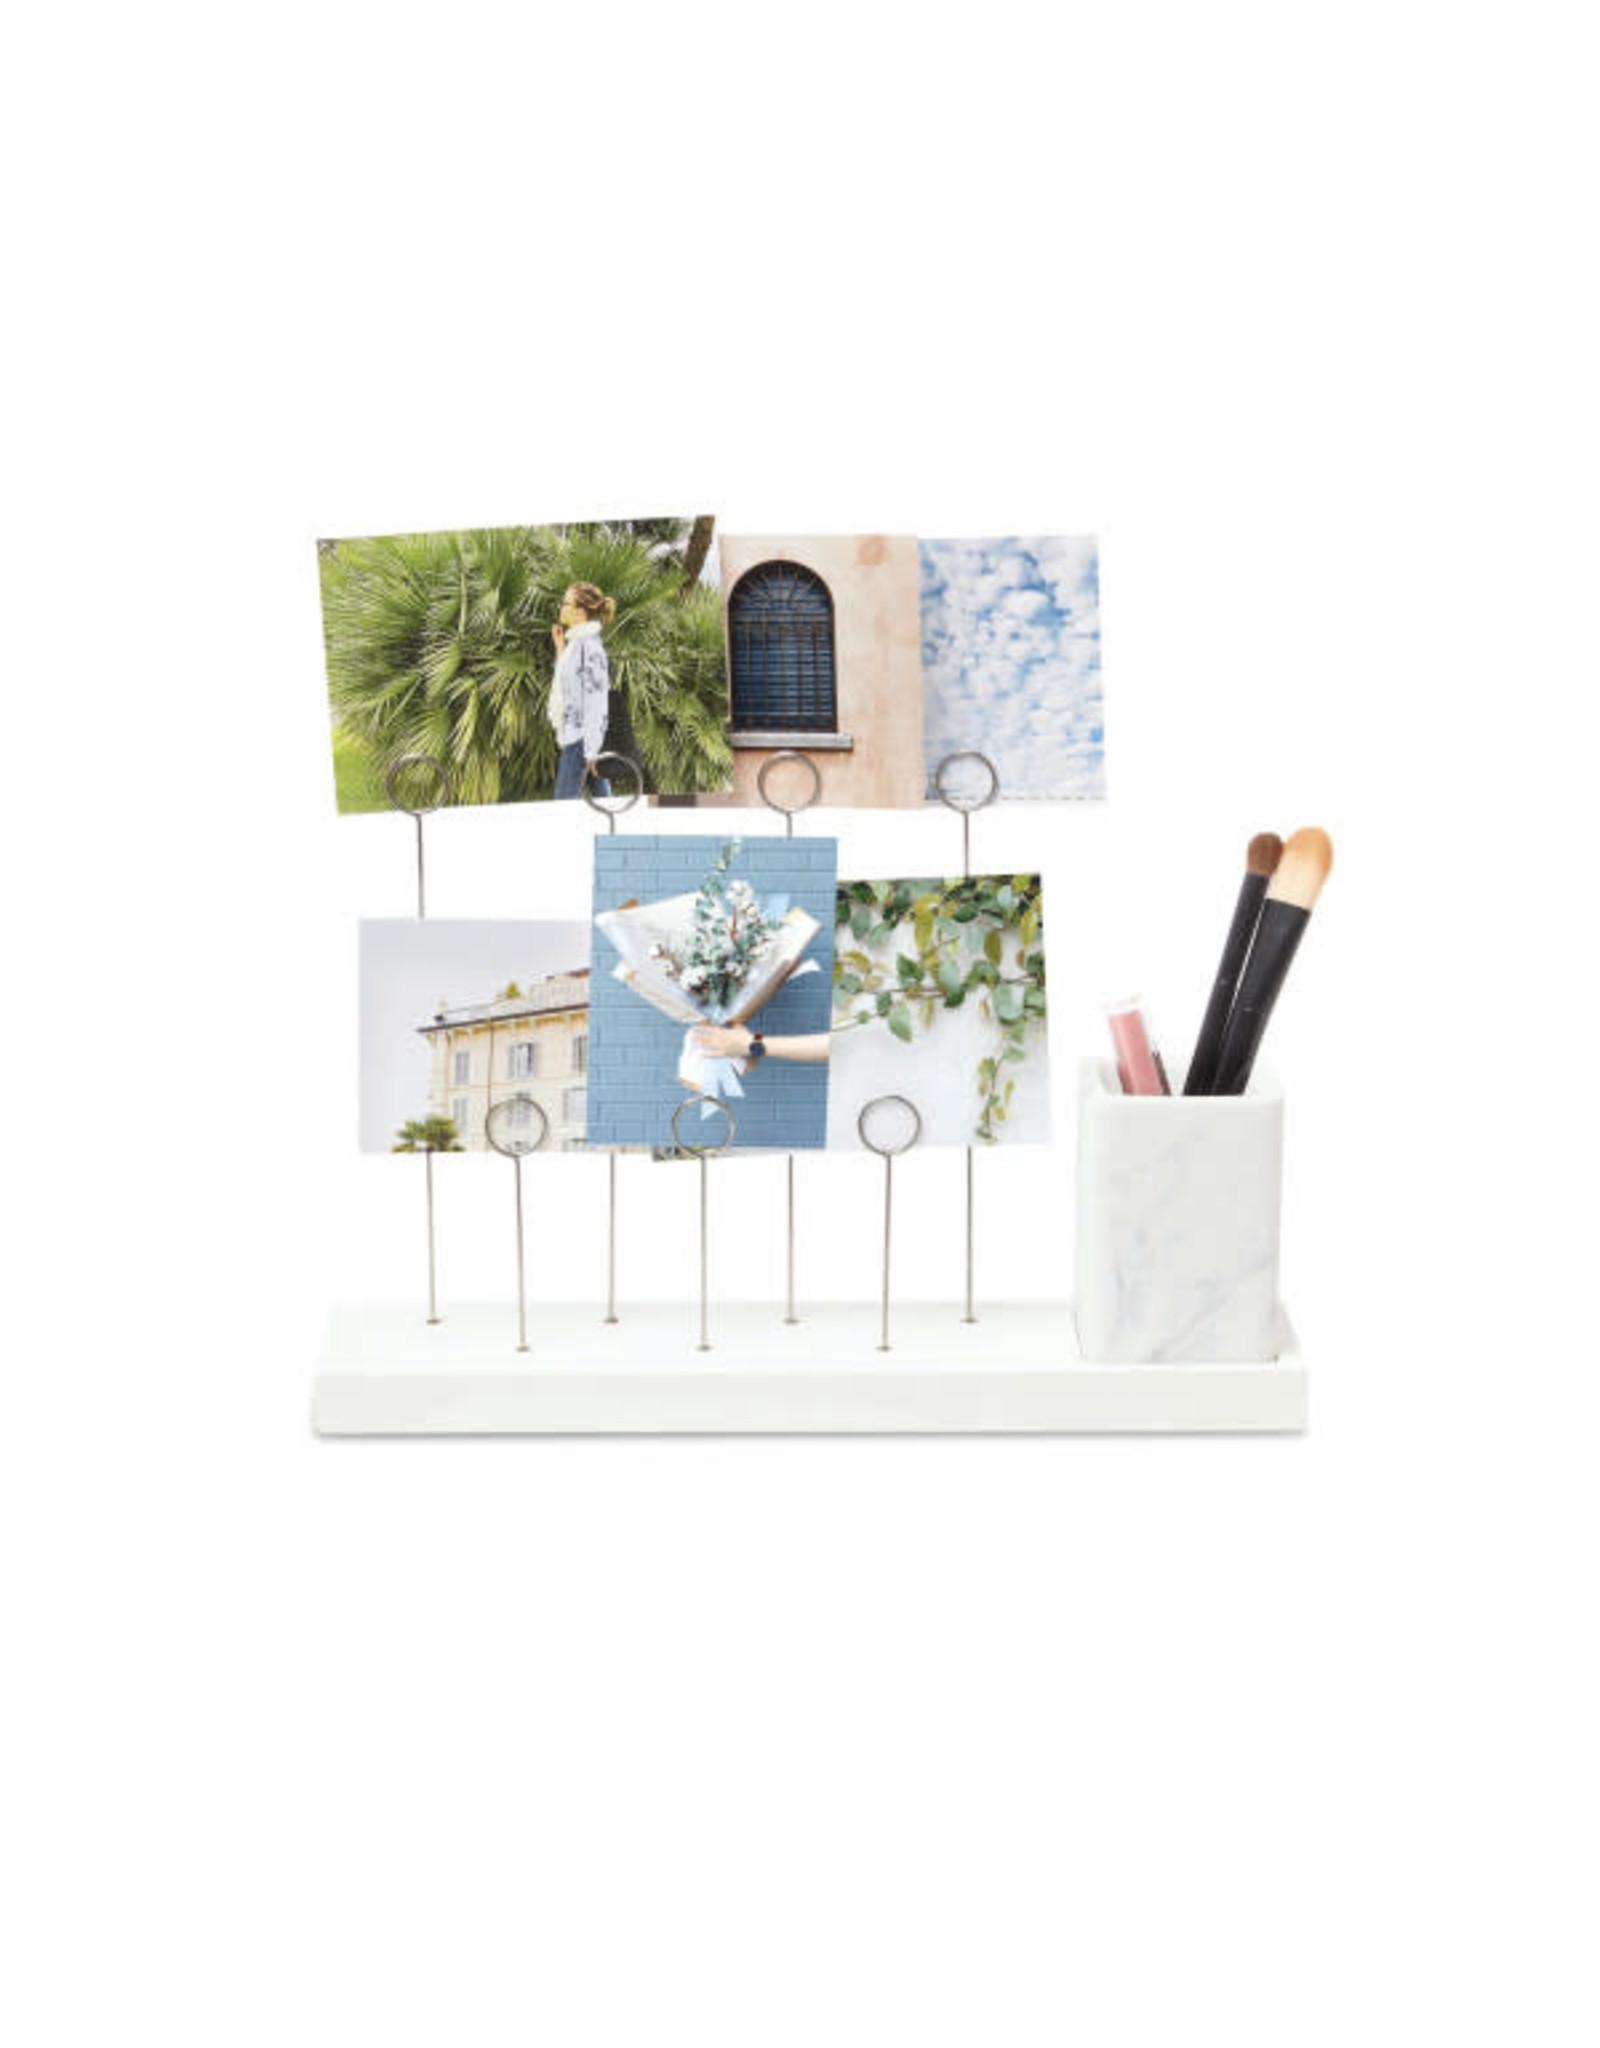 Umbra Gala photo display & pen holder (marble/white)